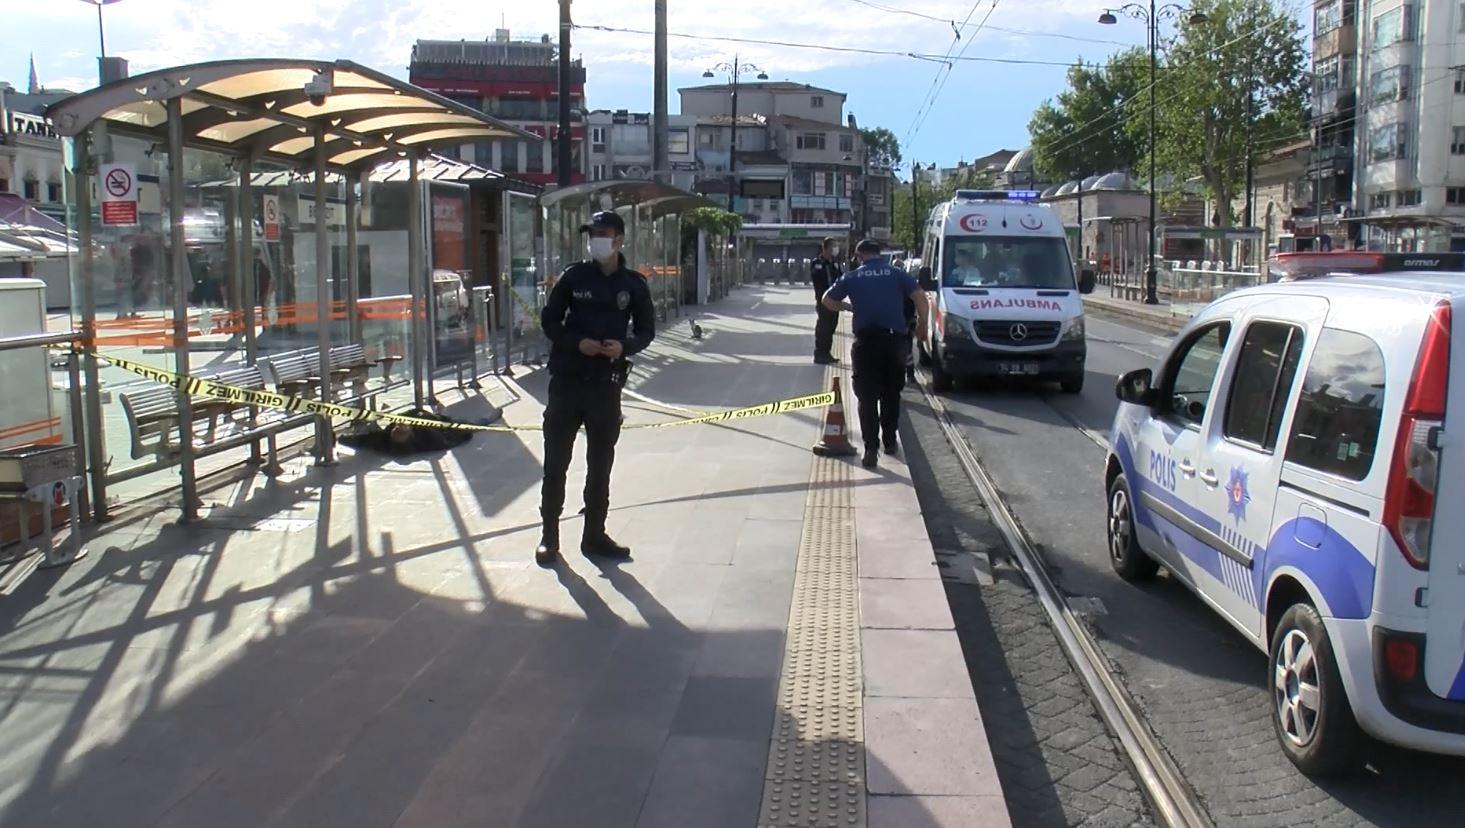 beyazit-tramvay-duraginda-ceset-bulundu-2967-dhaphoto1.jpg